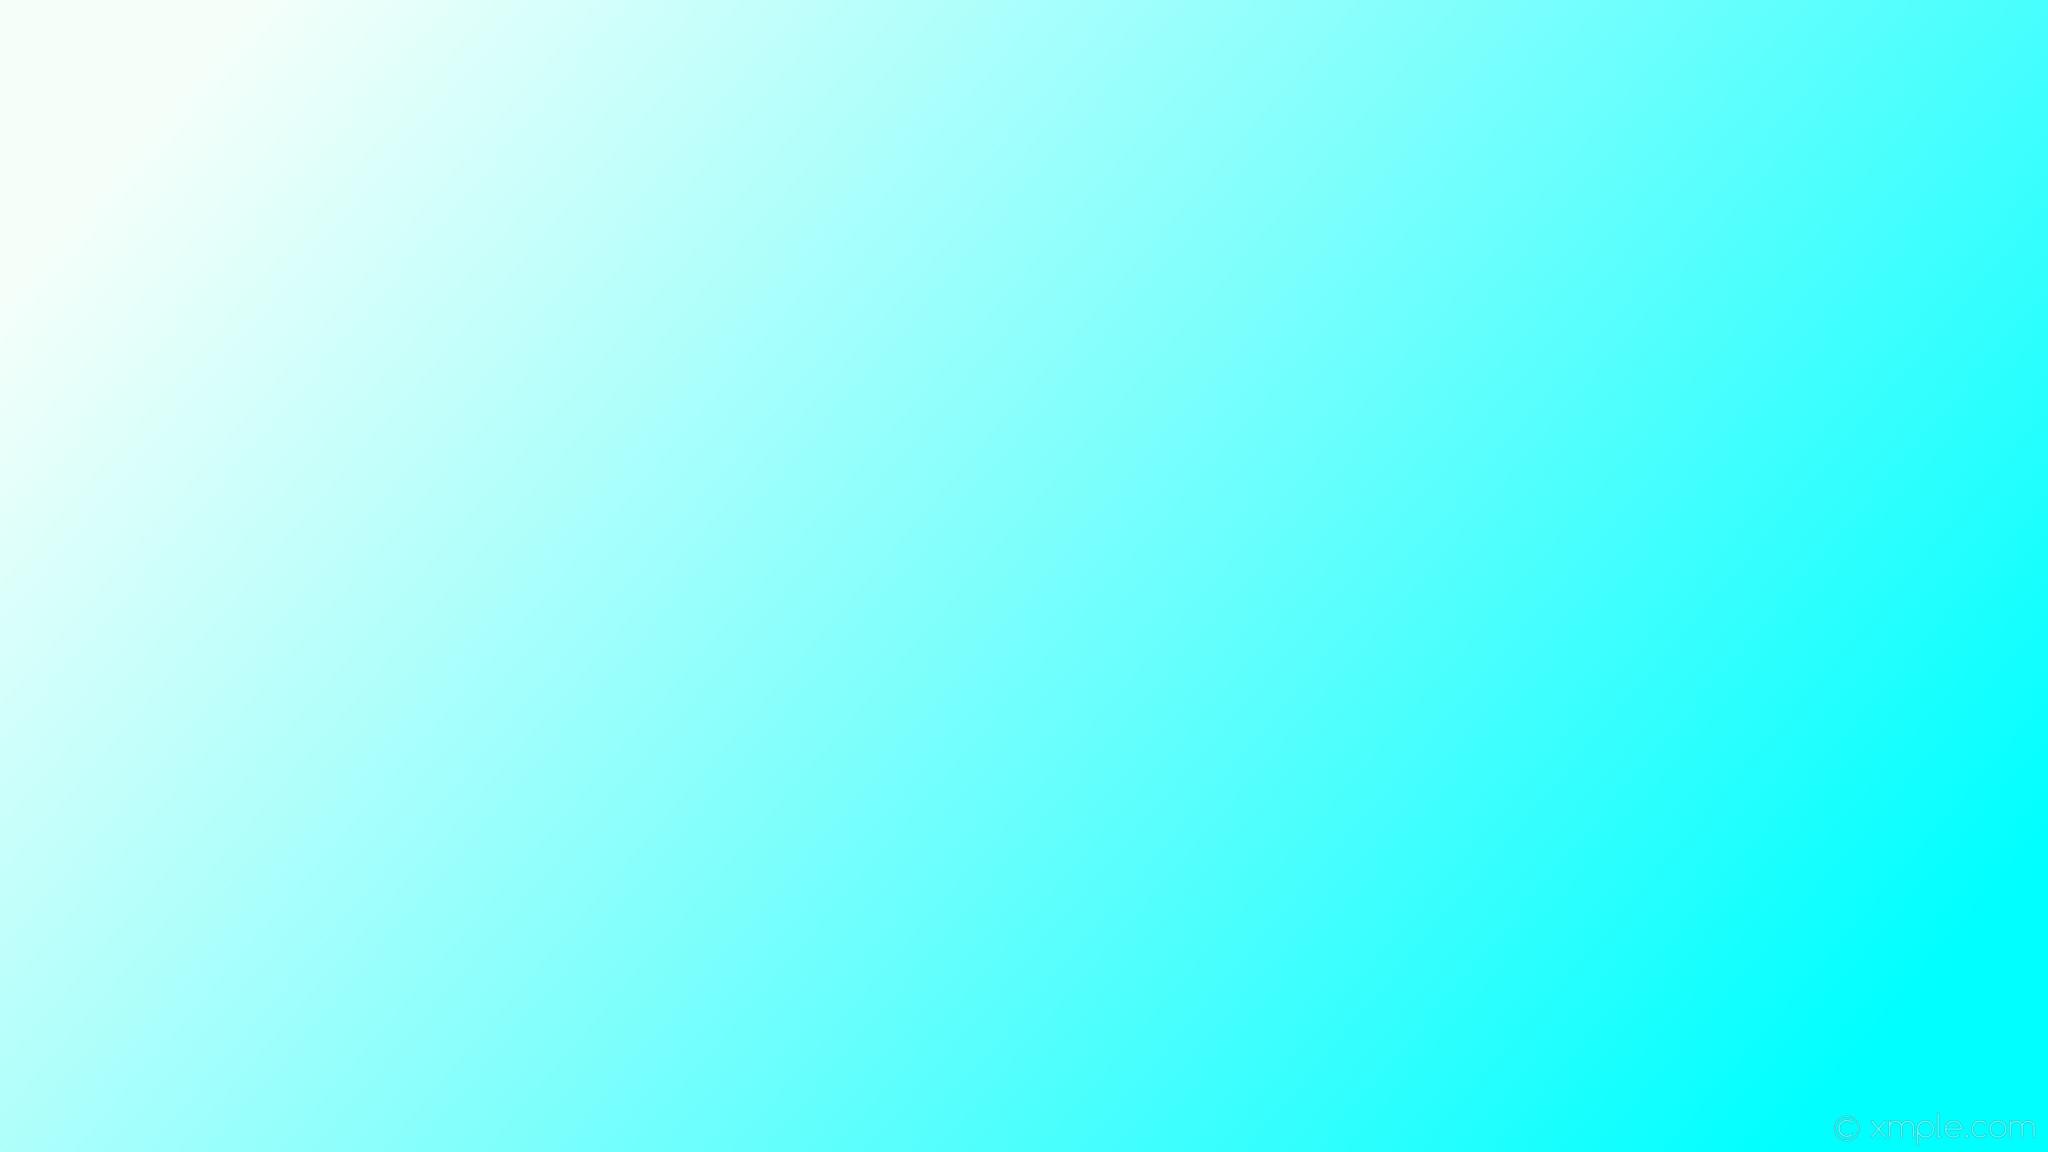 wallpaper linear gradient blue white mint cream aqua cyan #f5fffa #00ffff  165°